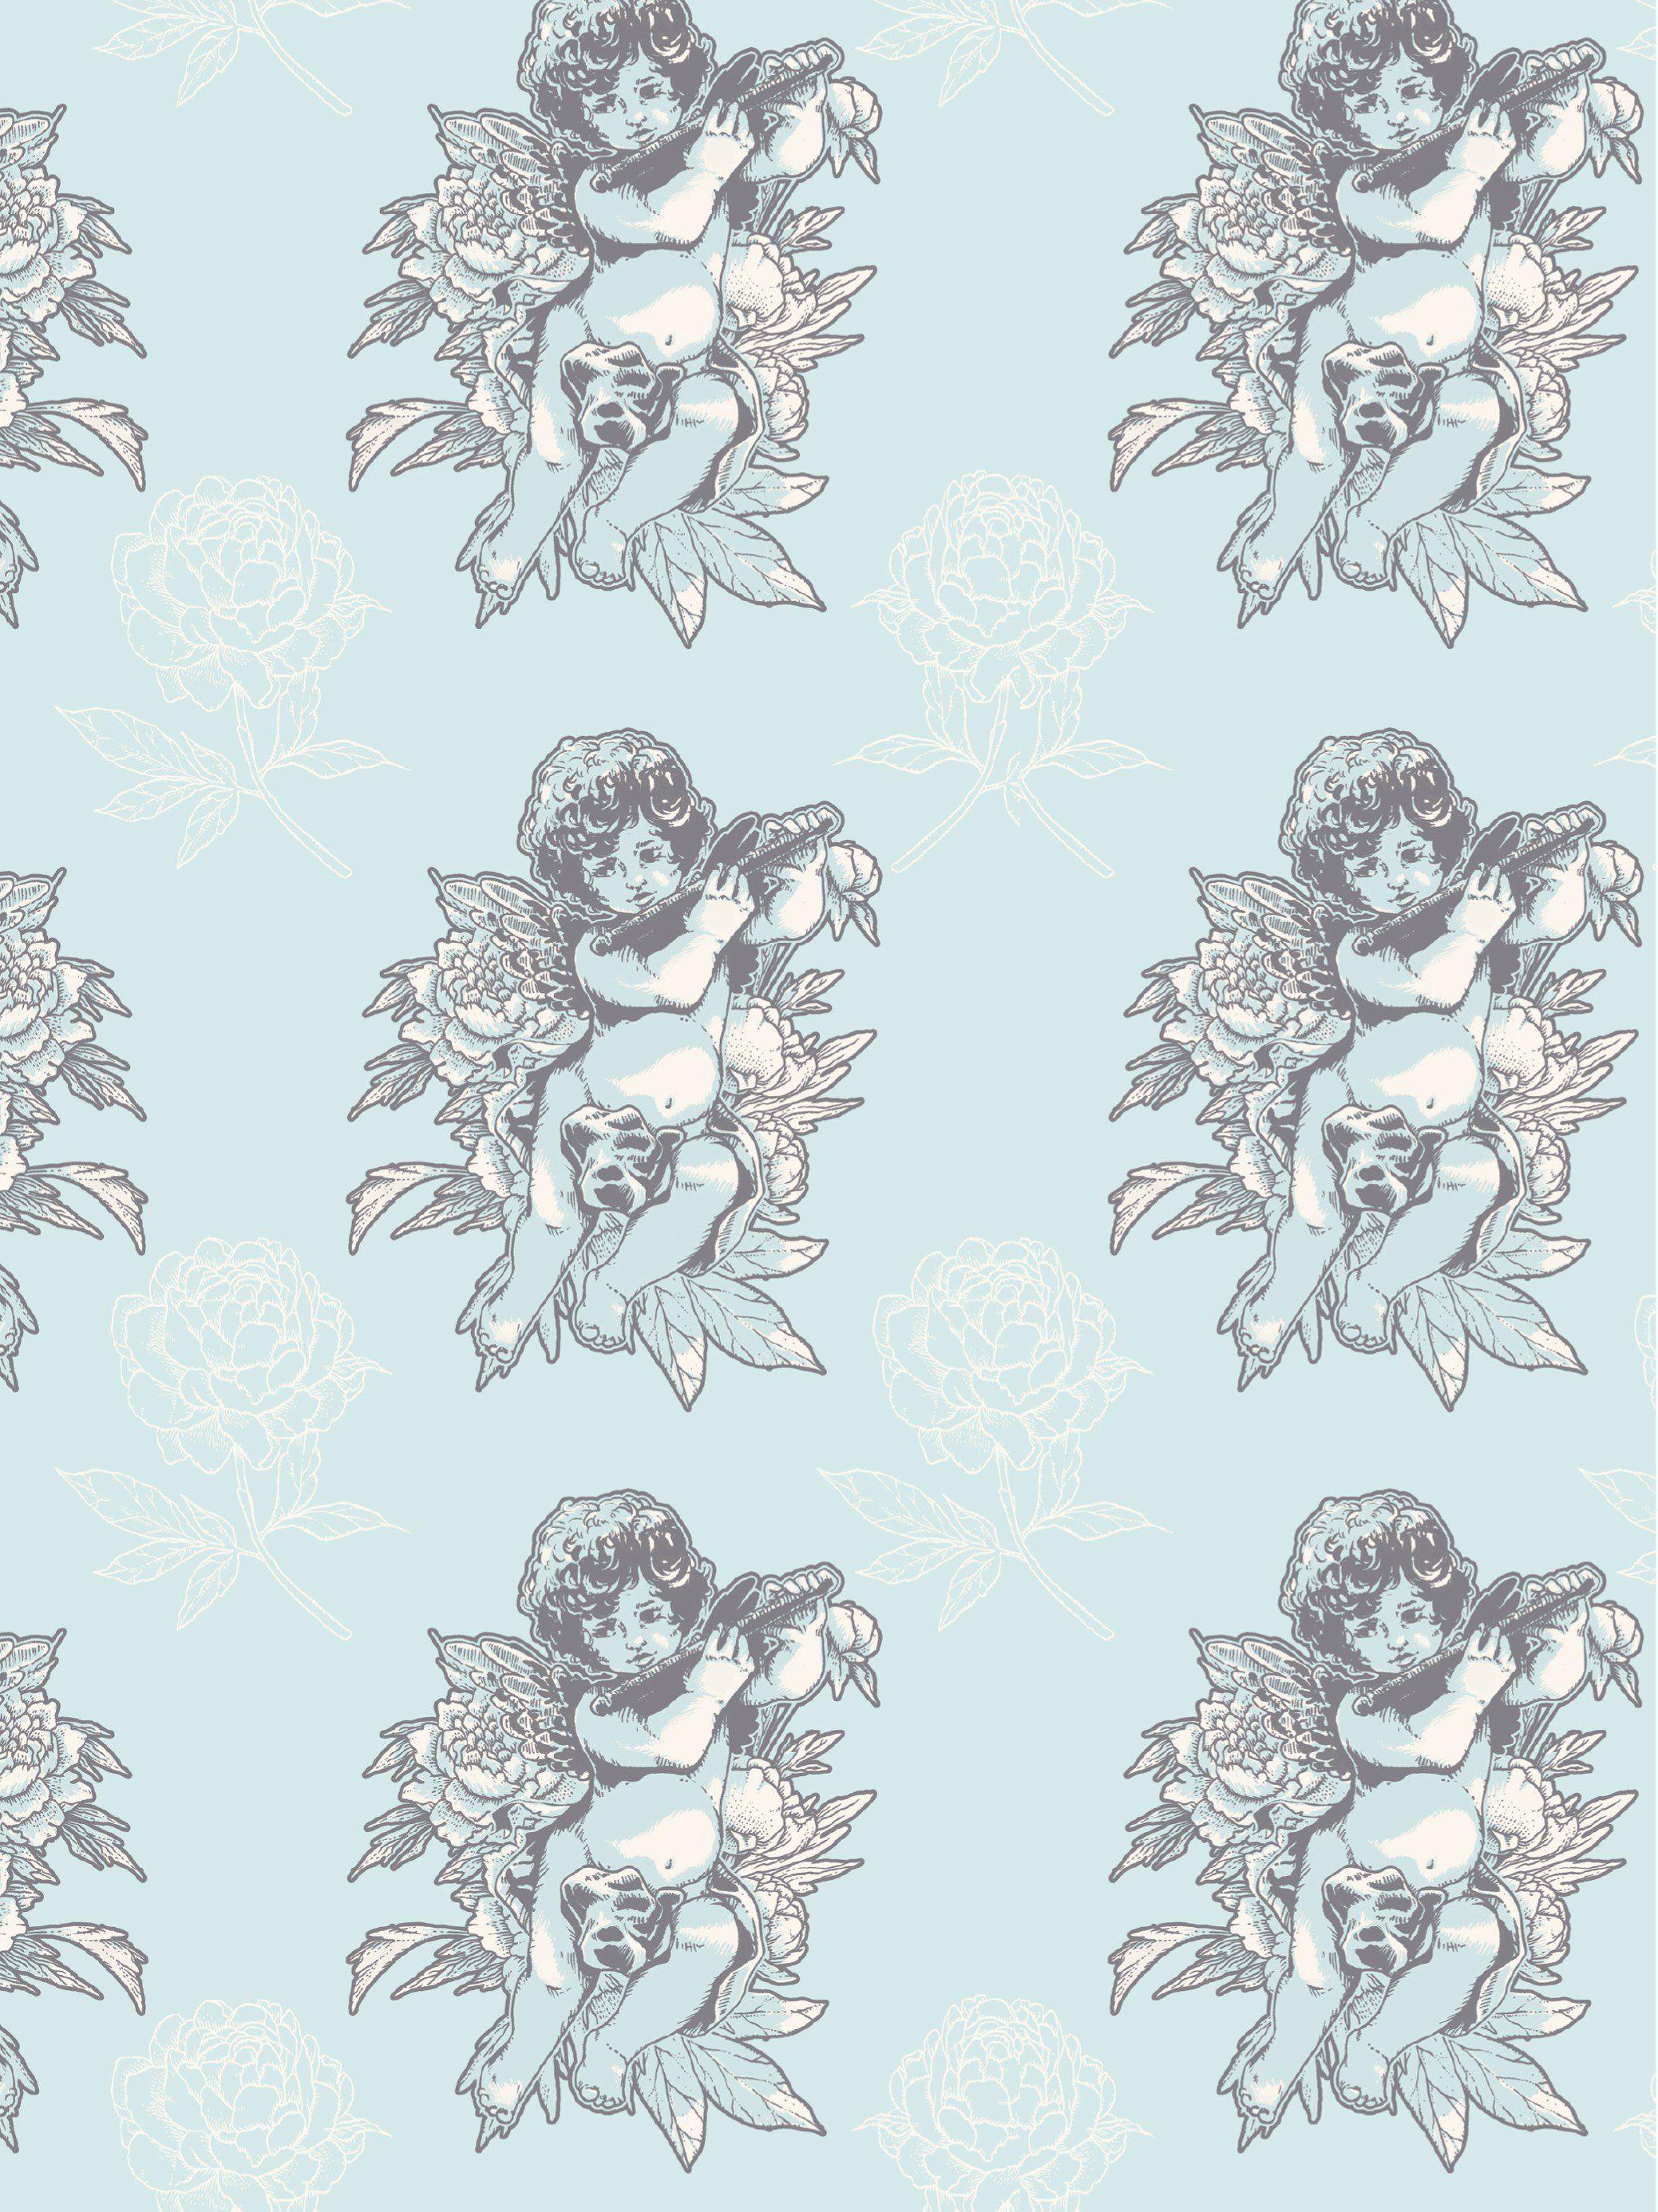 USED OPTIK BOOTS STIEFELETTEN DAMENSCHUHE DESIGNER NEU Gr 36 Blau Grau 2992